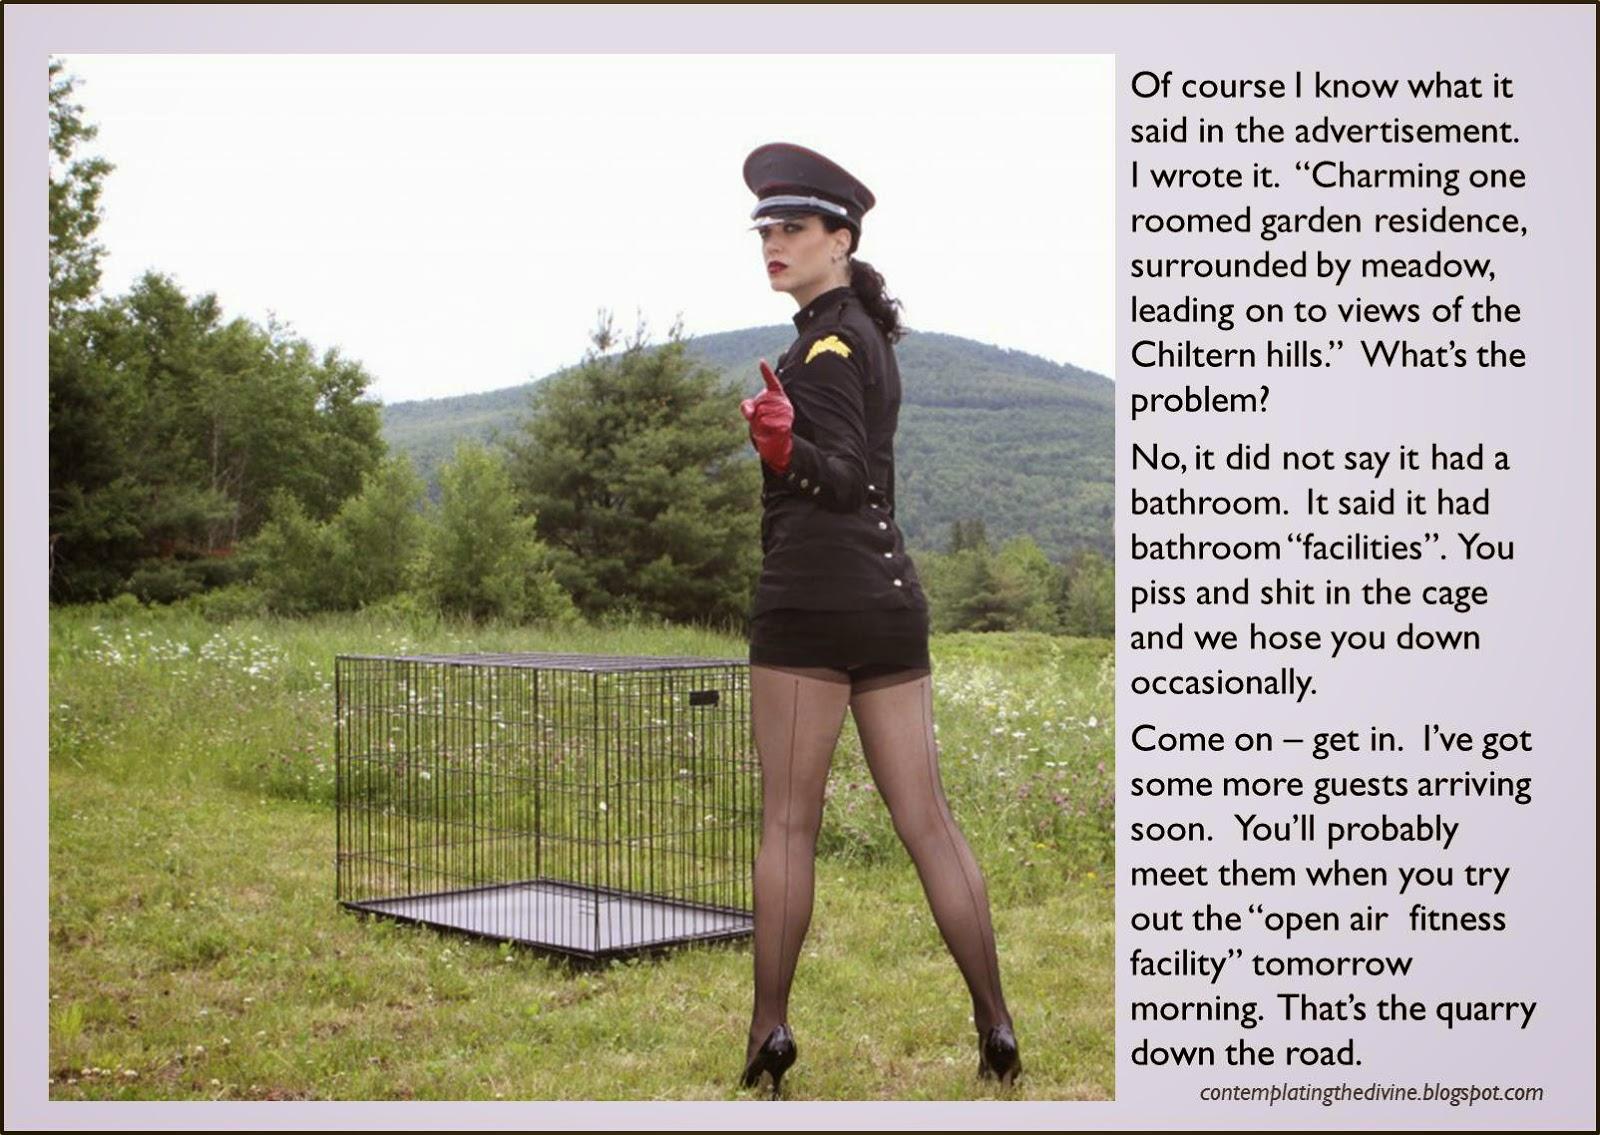 Mistress Bardot cages a guest